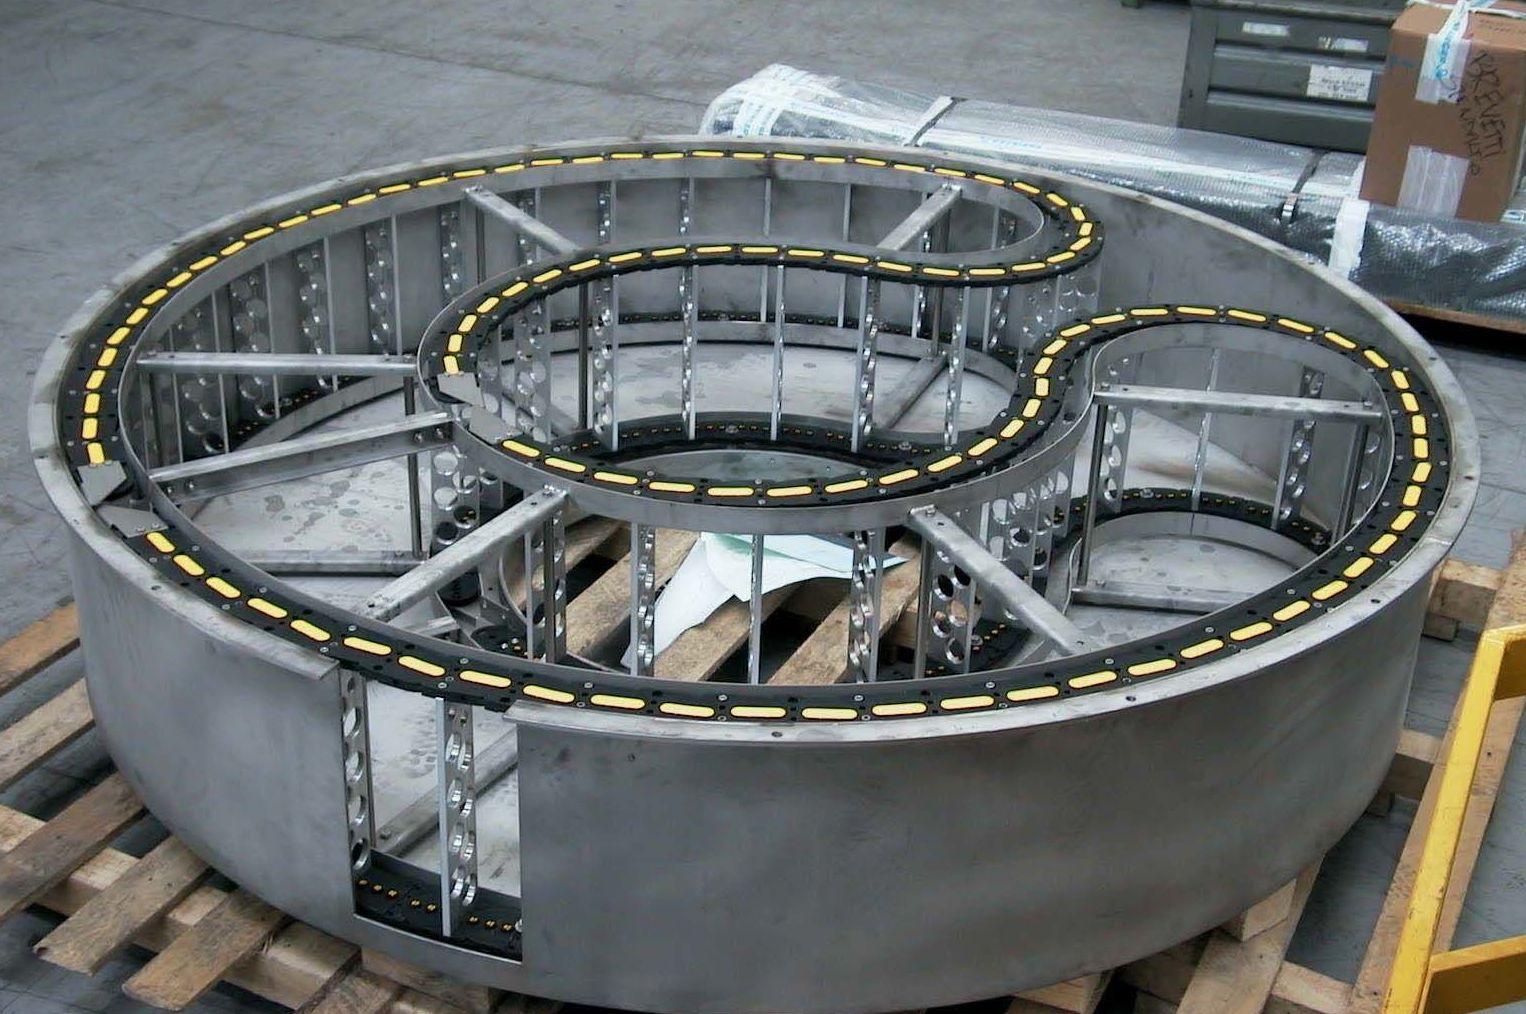 Cadena portcables de nylon con contragiro y traviesas mecanizadas BREVETTI STENDALTO